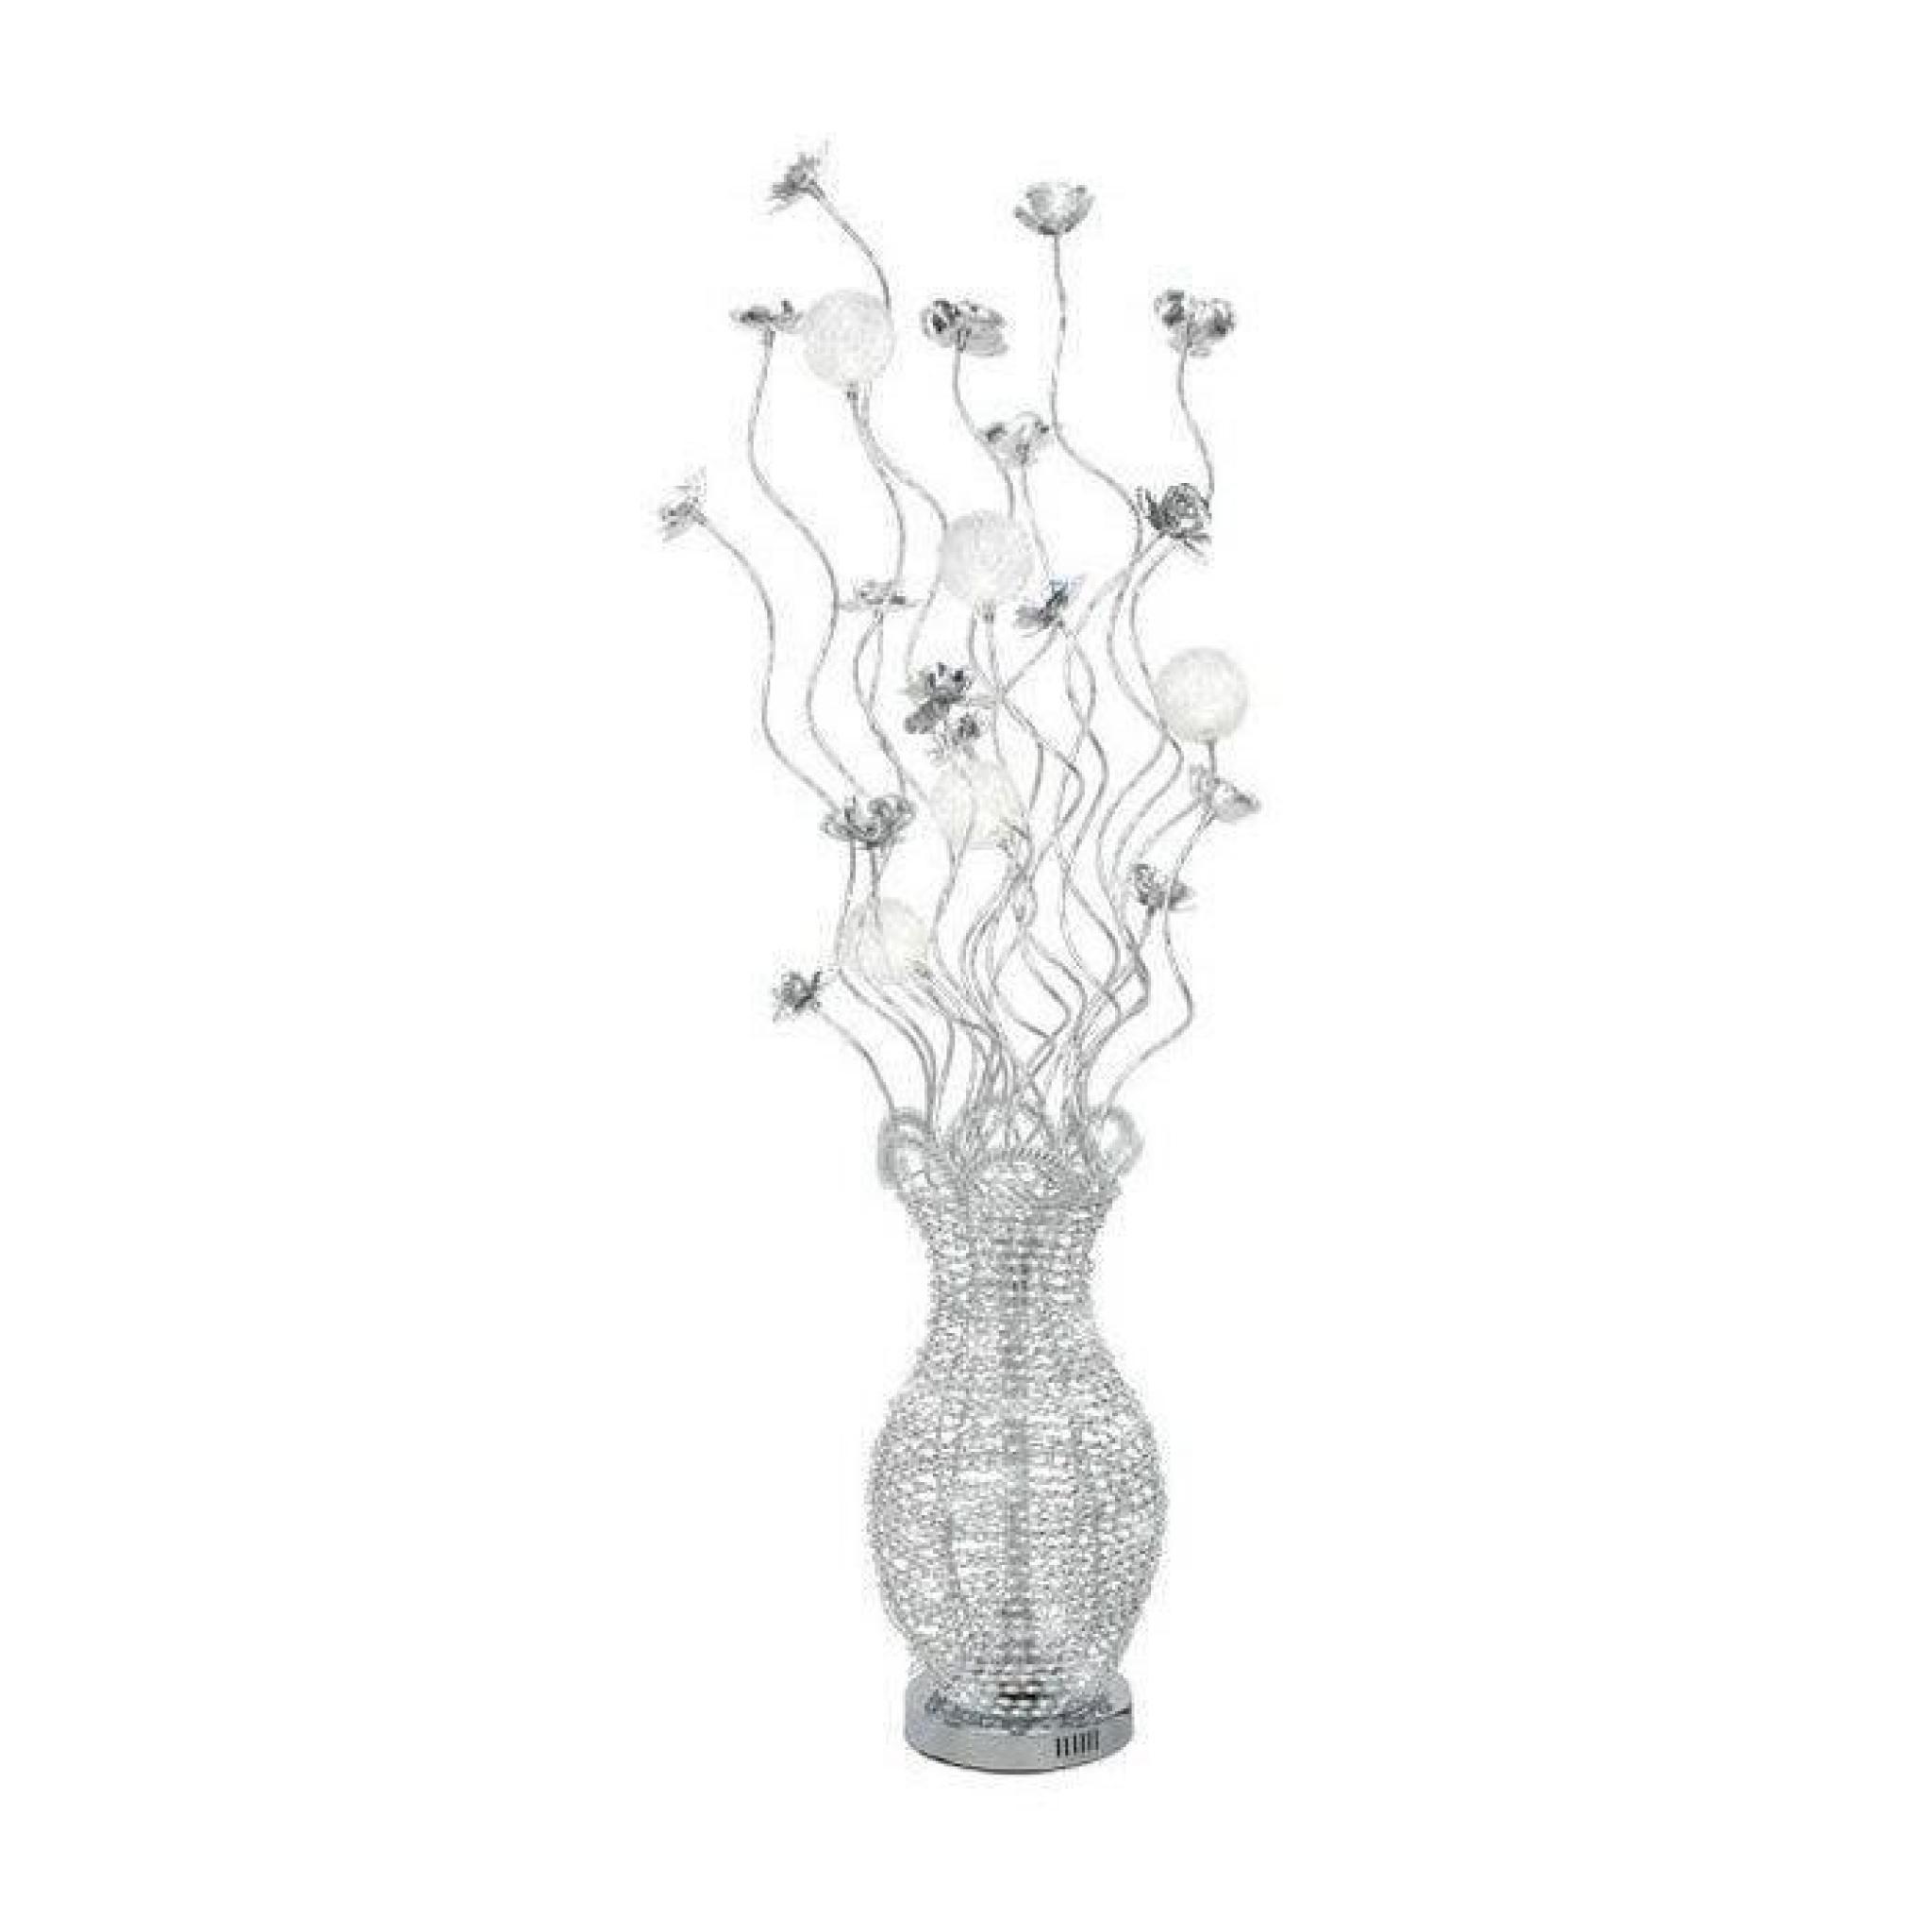 lampadaire aluminium chrome bella led 5x 20w boutica design achat vente lampadaire pas cher. Black Bedroom Furniture Sets. Home Design Ideas